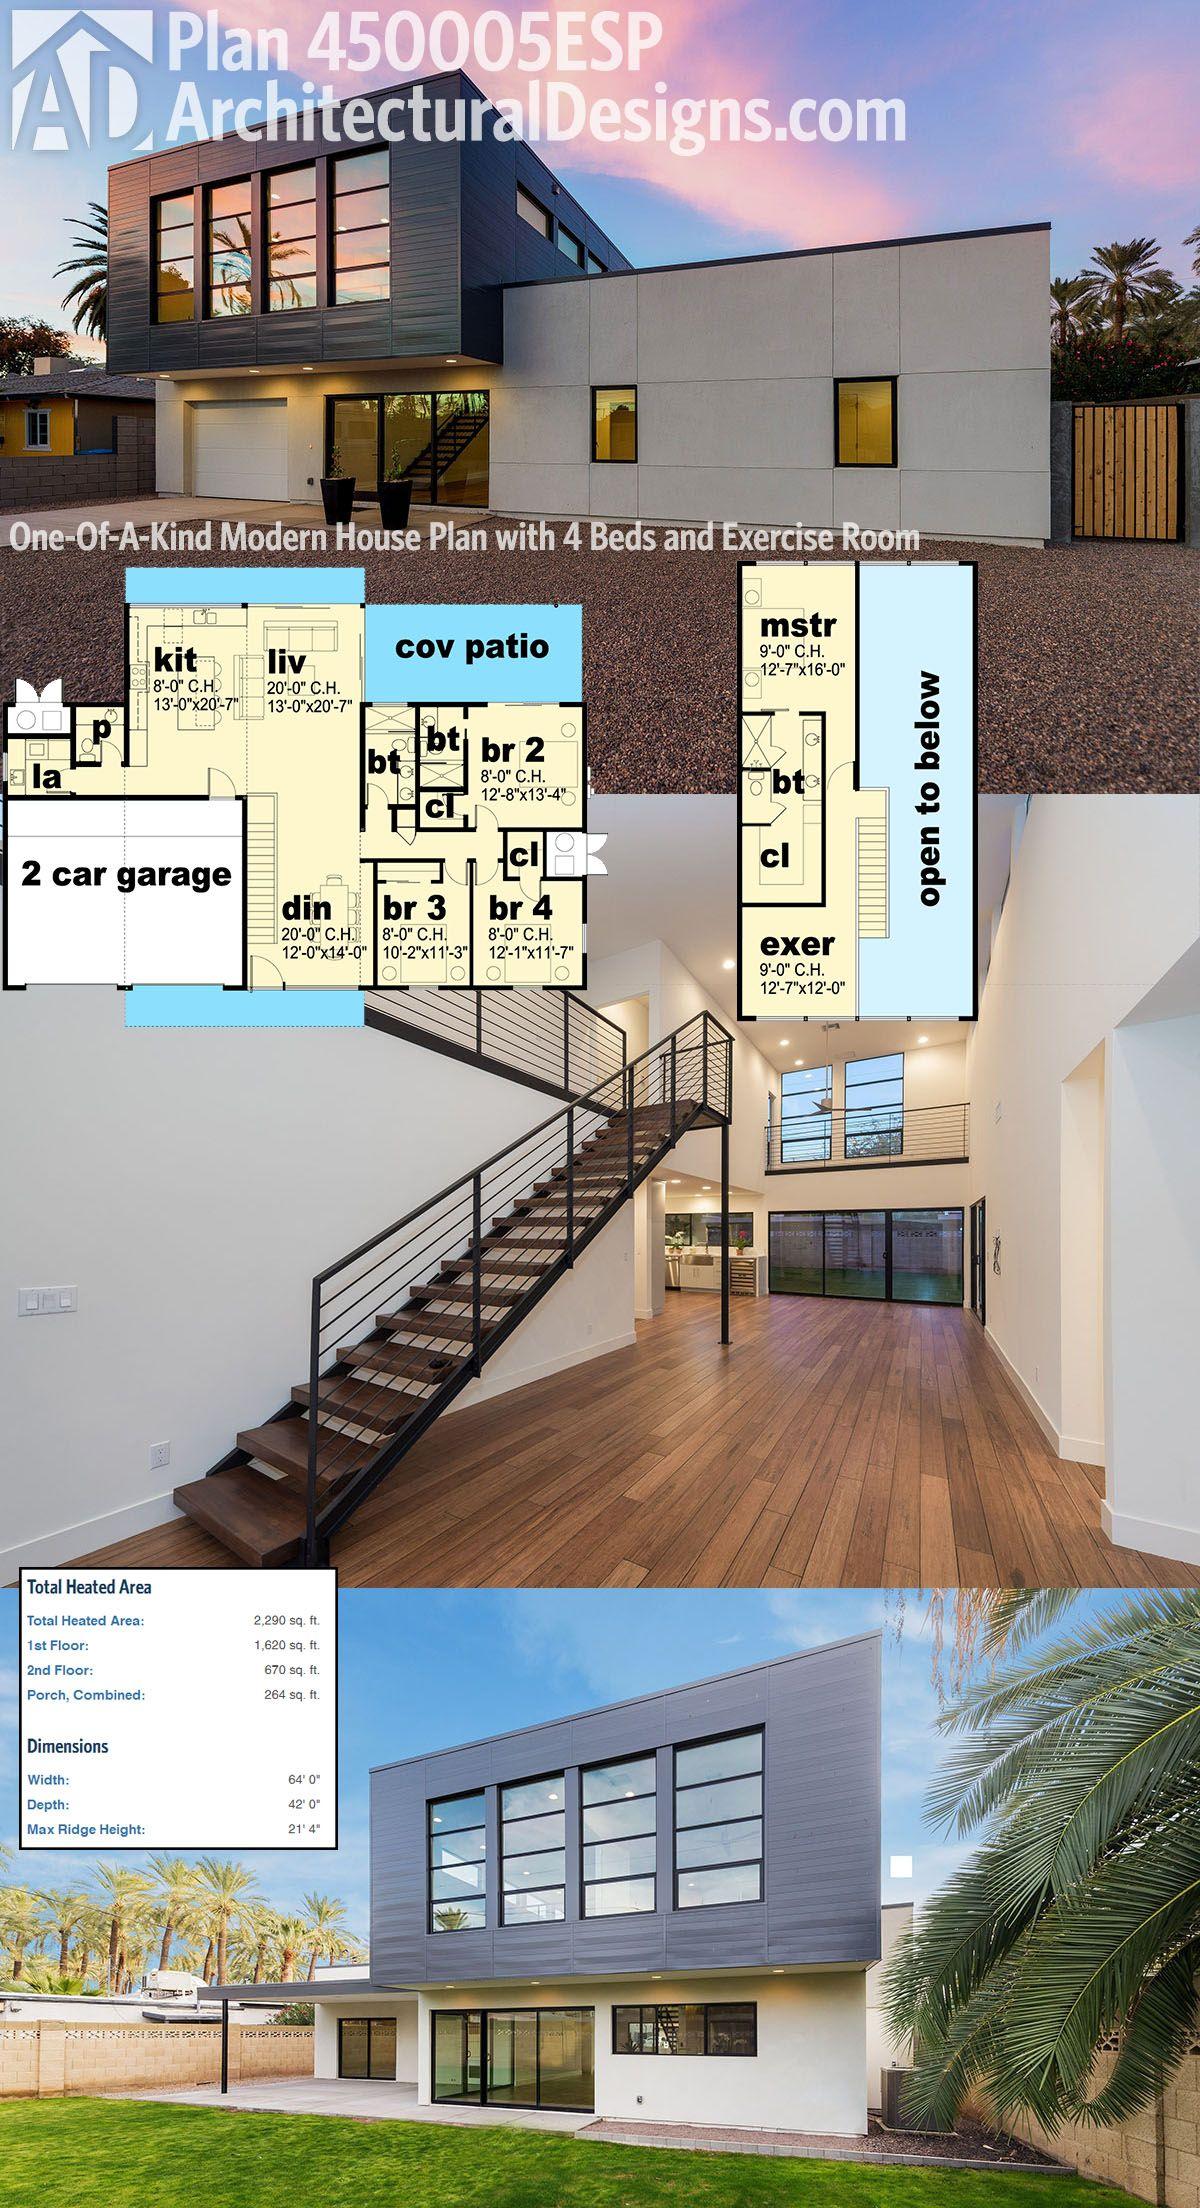 beach house idea Plan 450005ESP One Of A Kind Modern